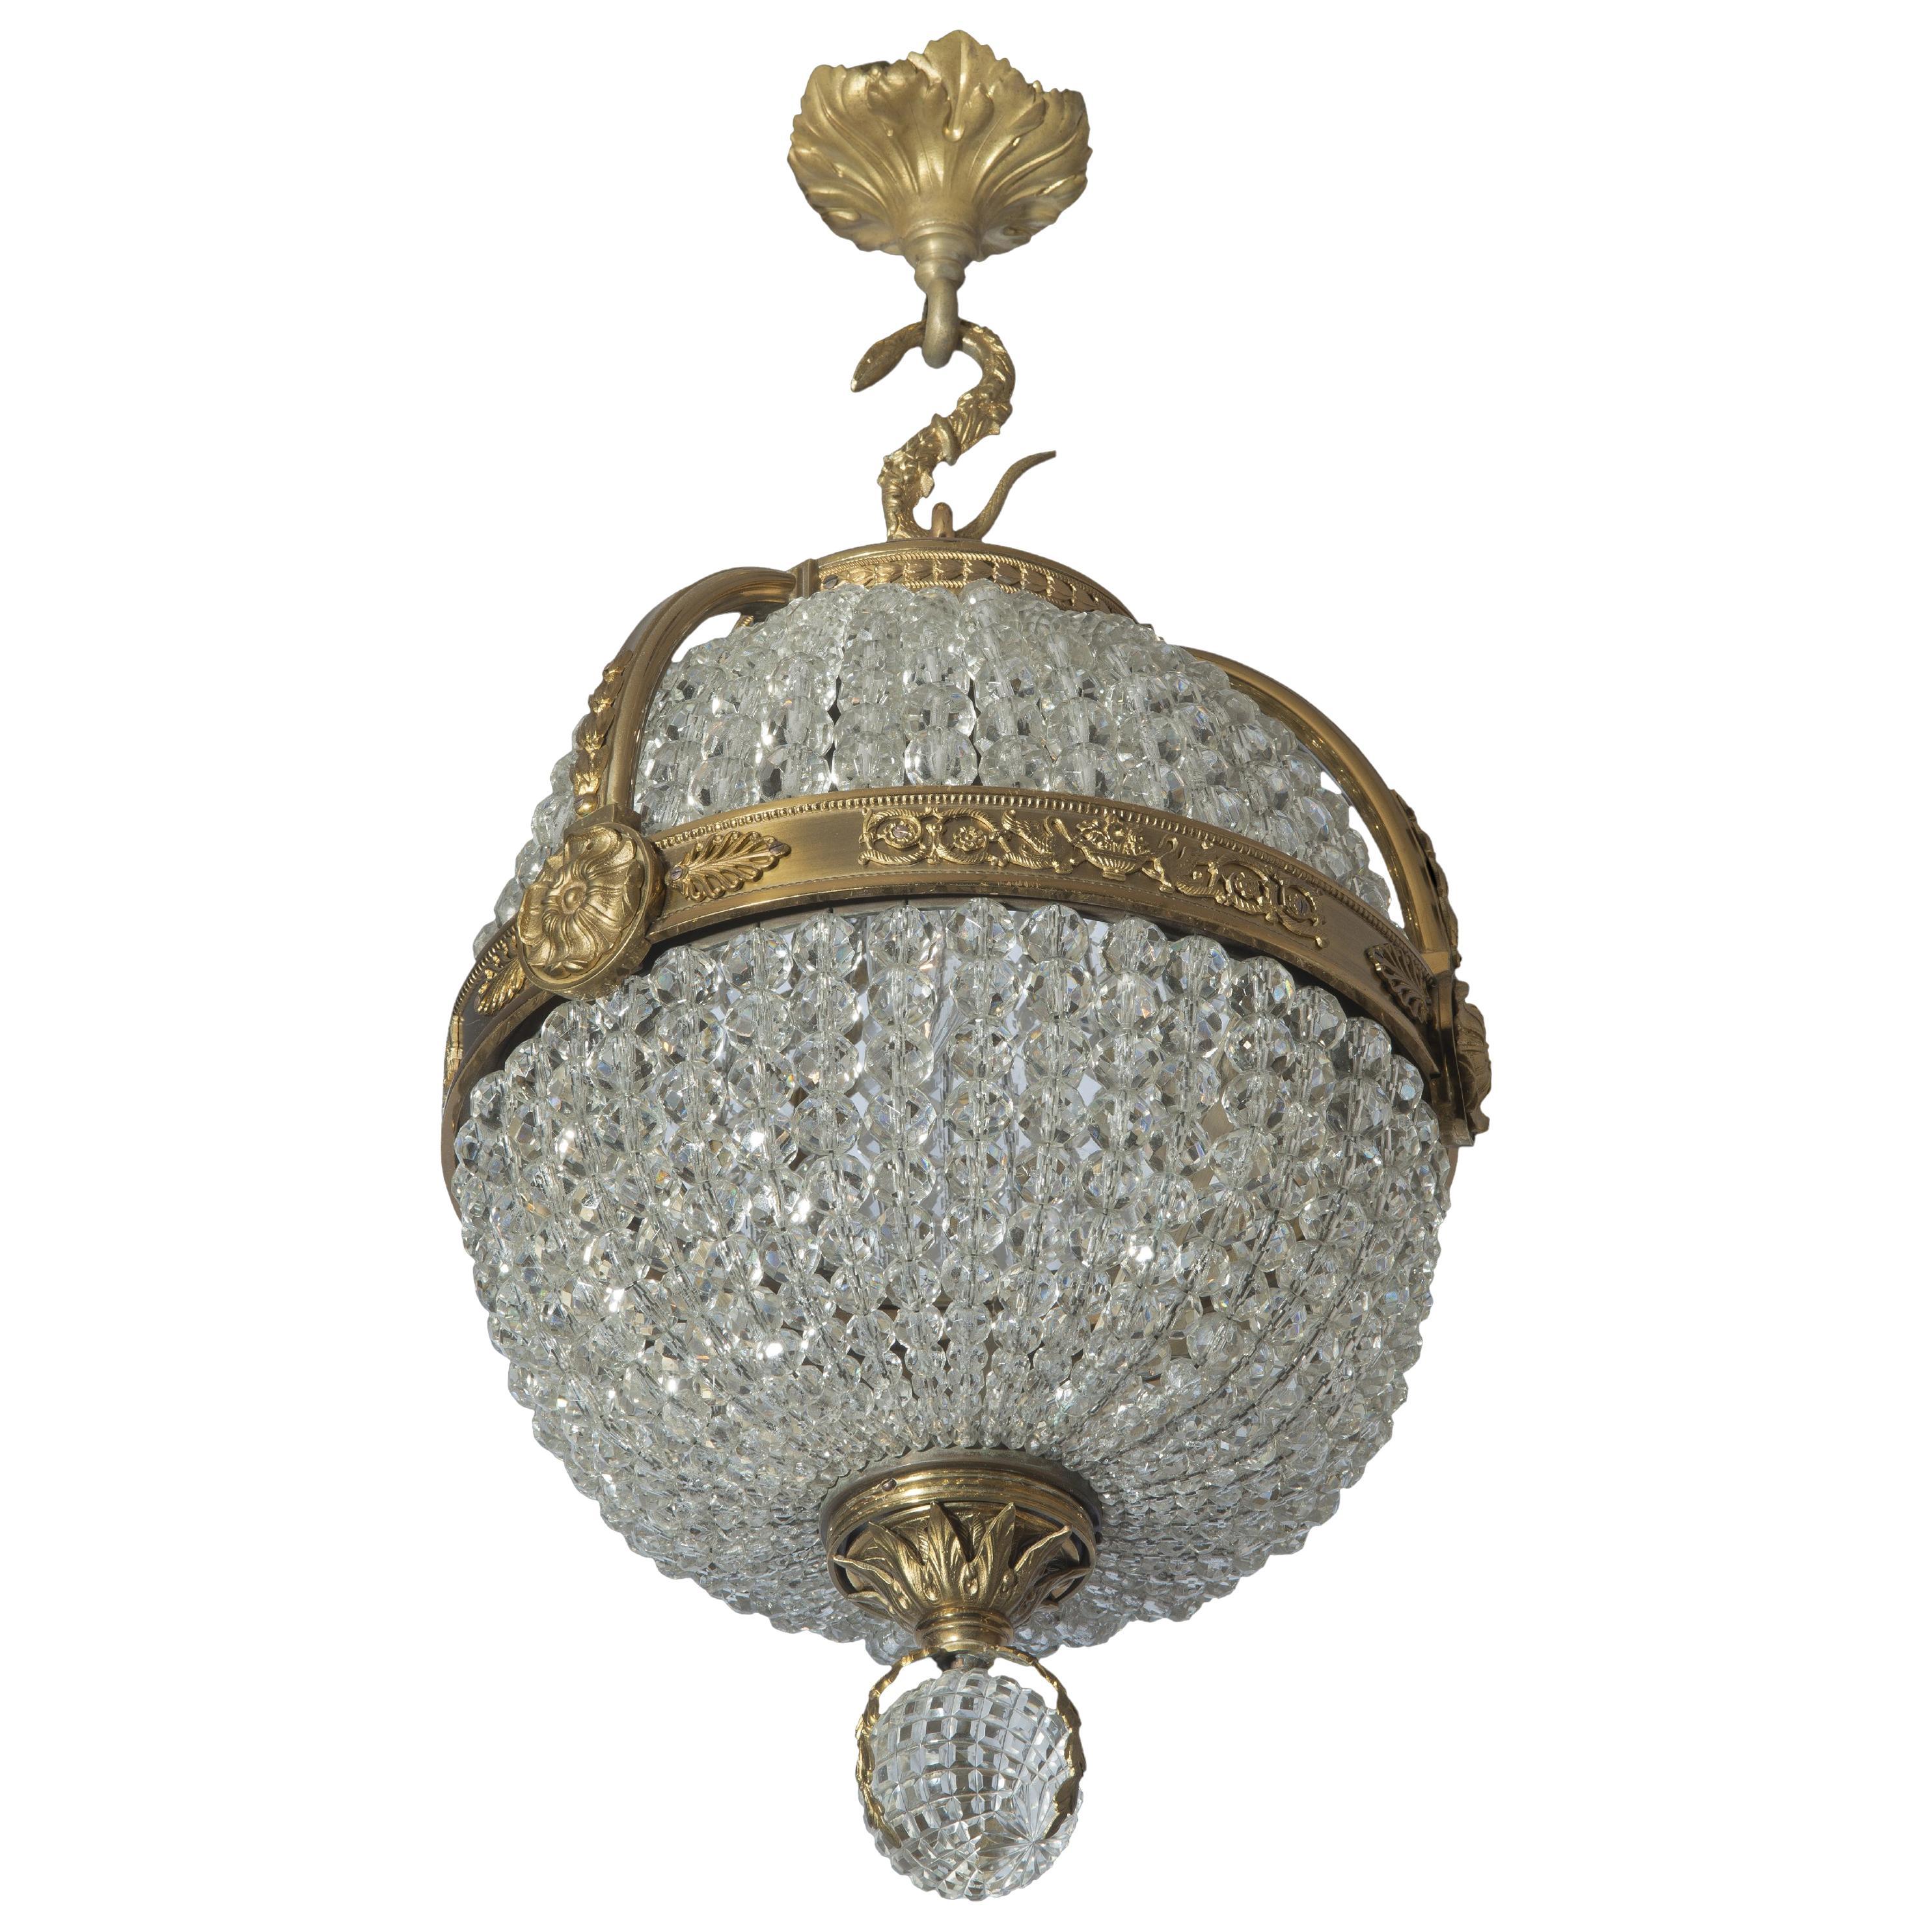 Empire Revival Gilt-Bronze and Cut-Glass Pendant Chandelier, circa 1910